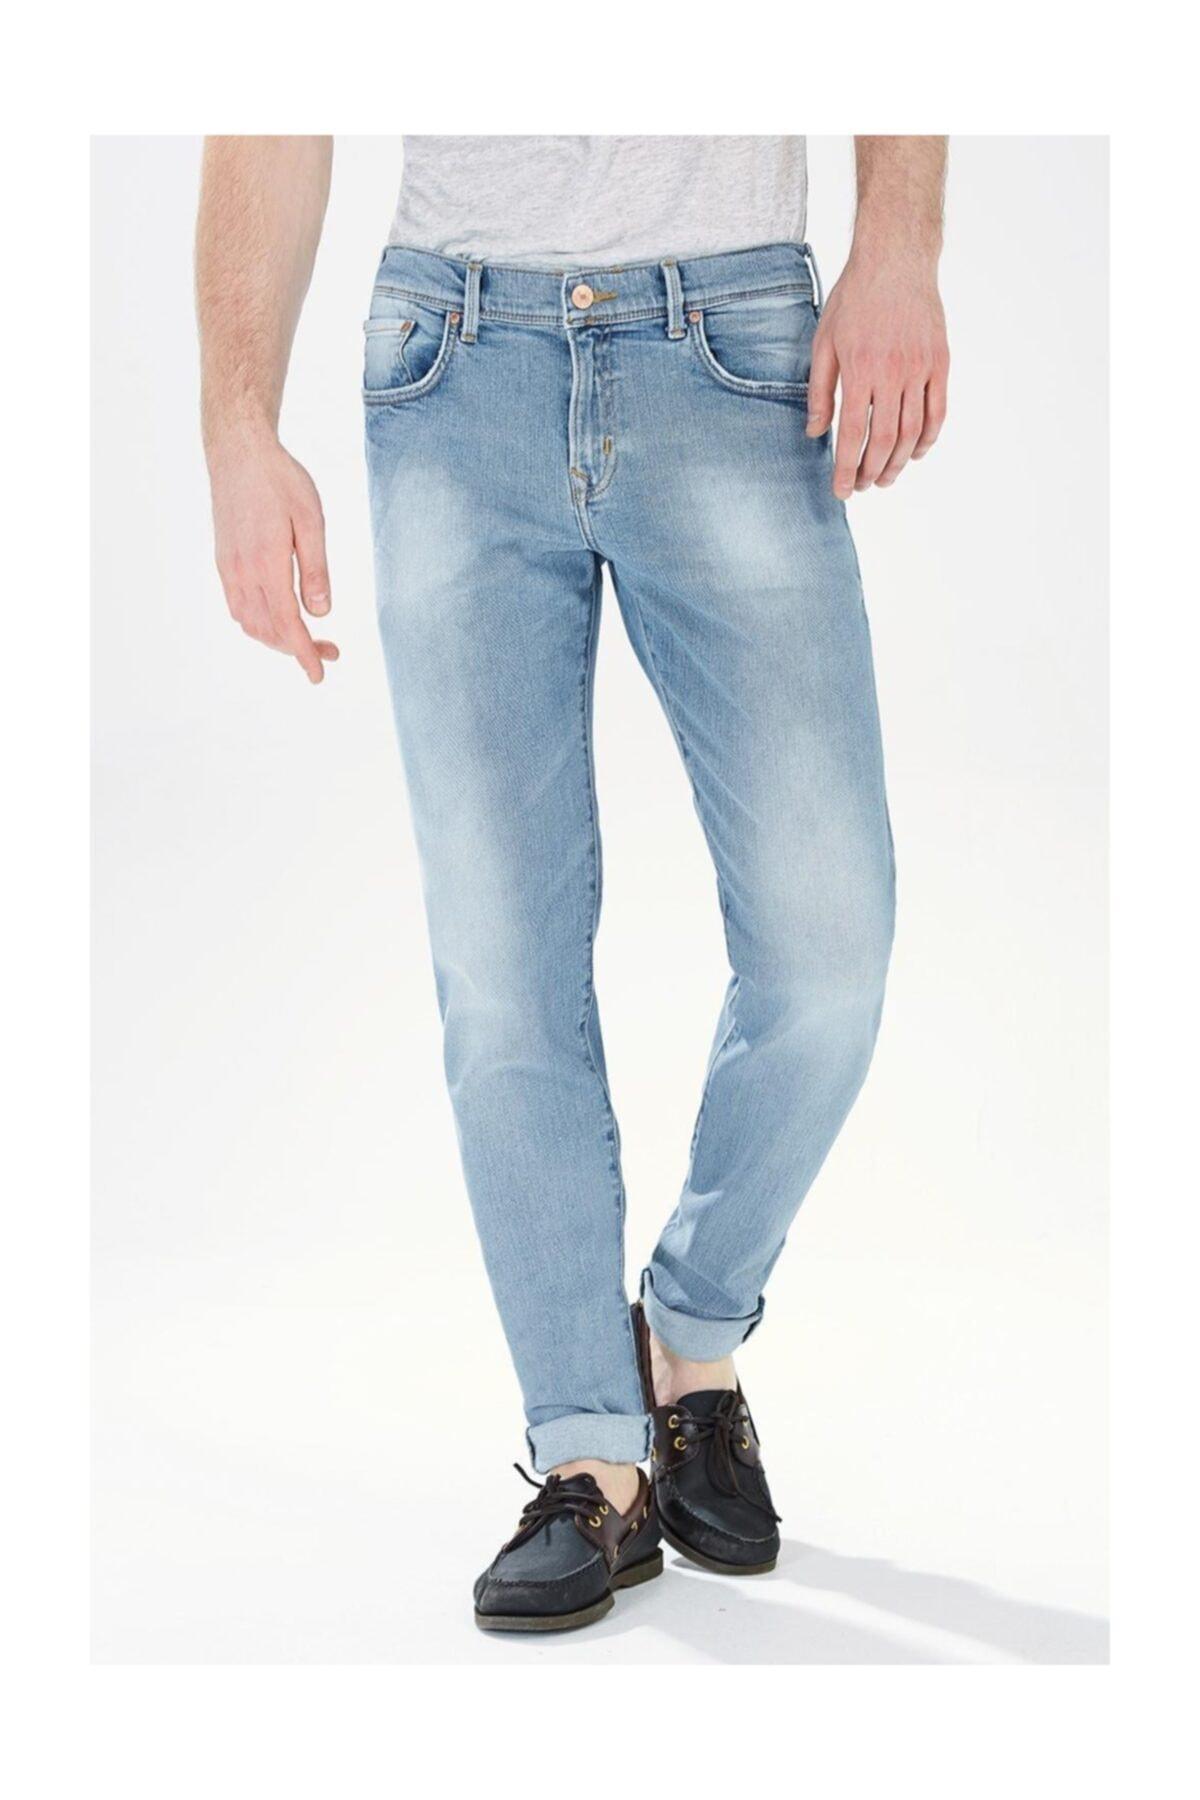 Ltb Dıego Fredrıck Wash Jeans Pantolon 0100950260135022262 1